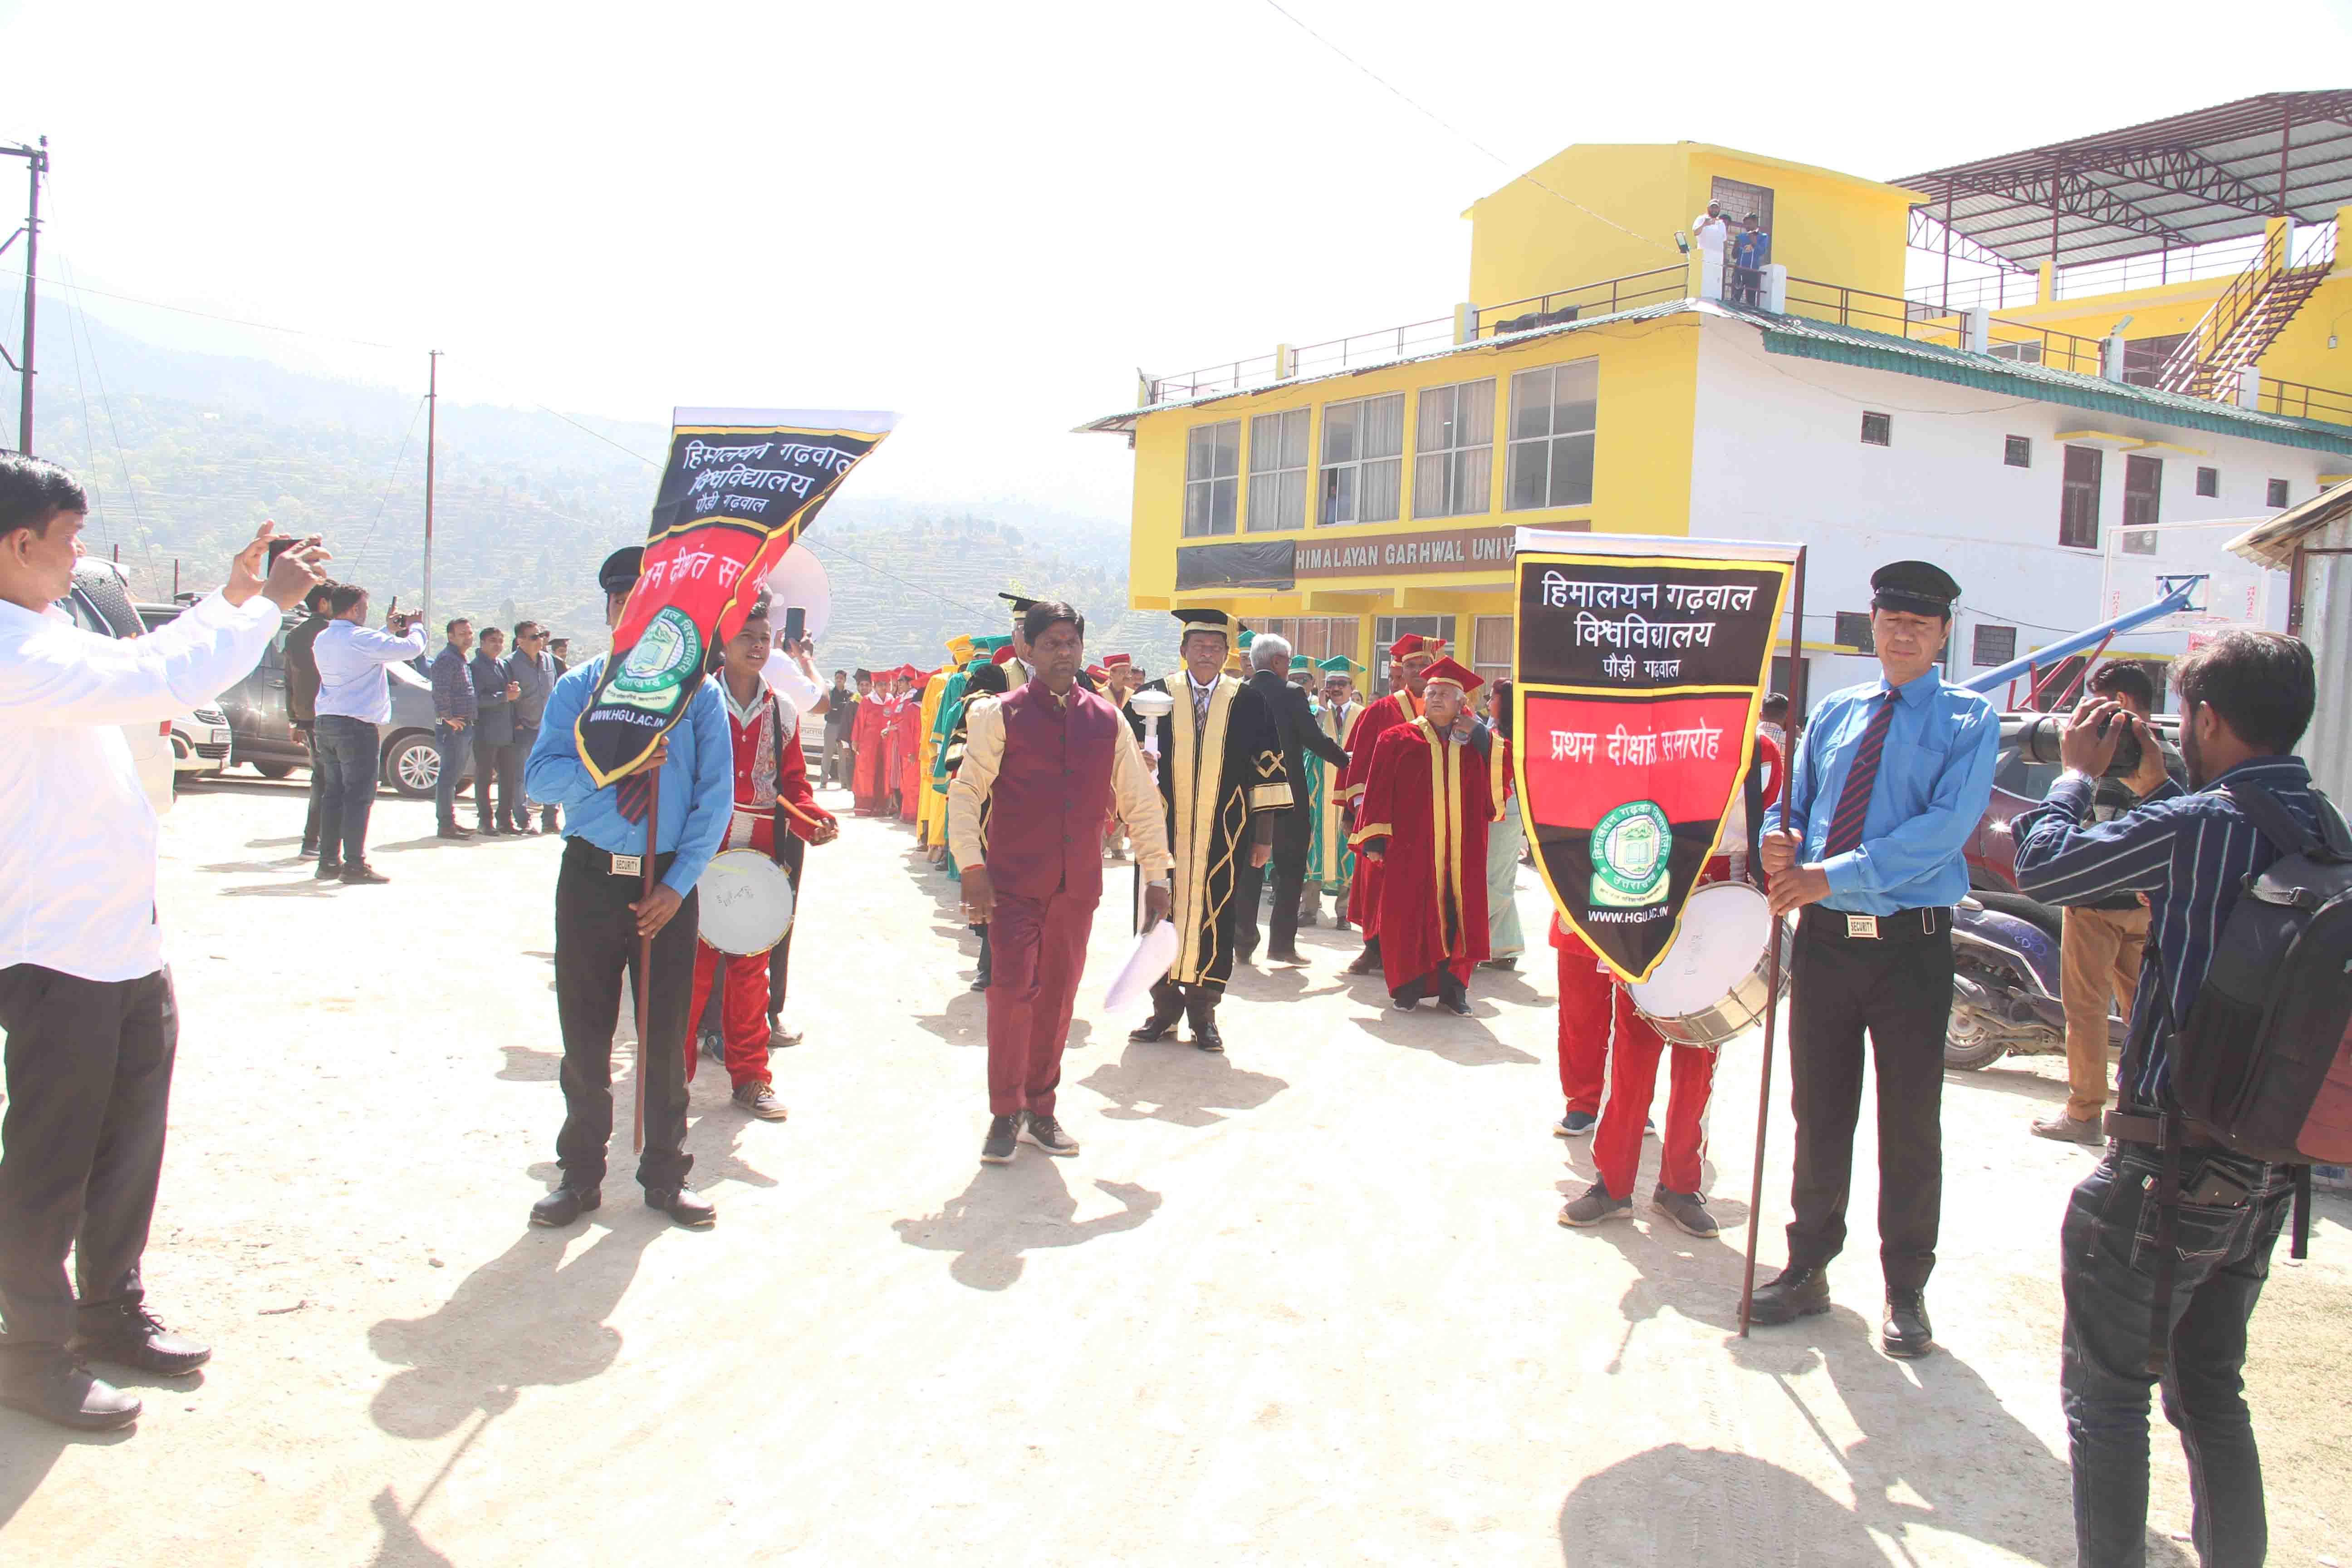 Himalayan Garhwal University Staff